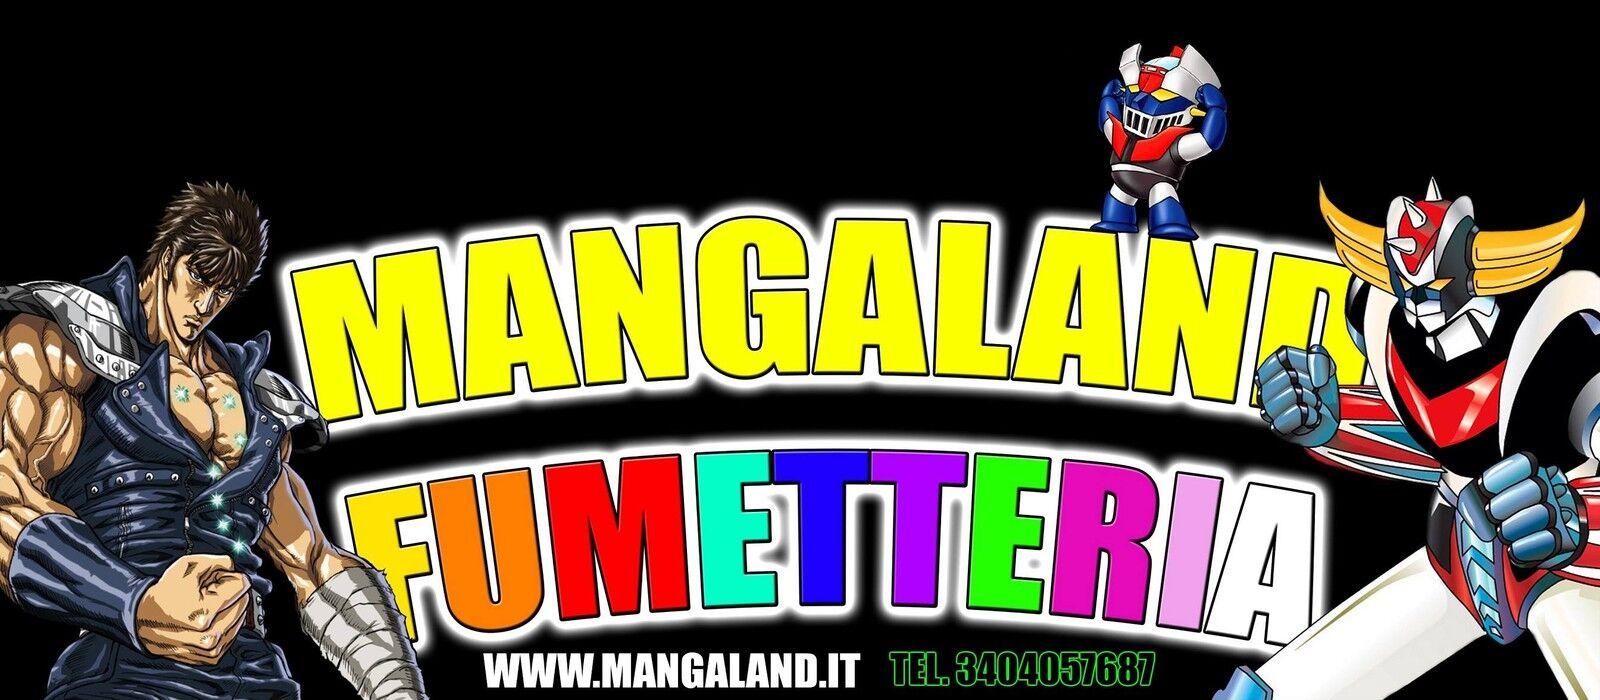 MANGALAND FUMETTERIA